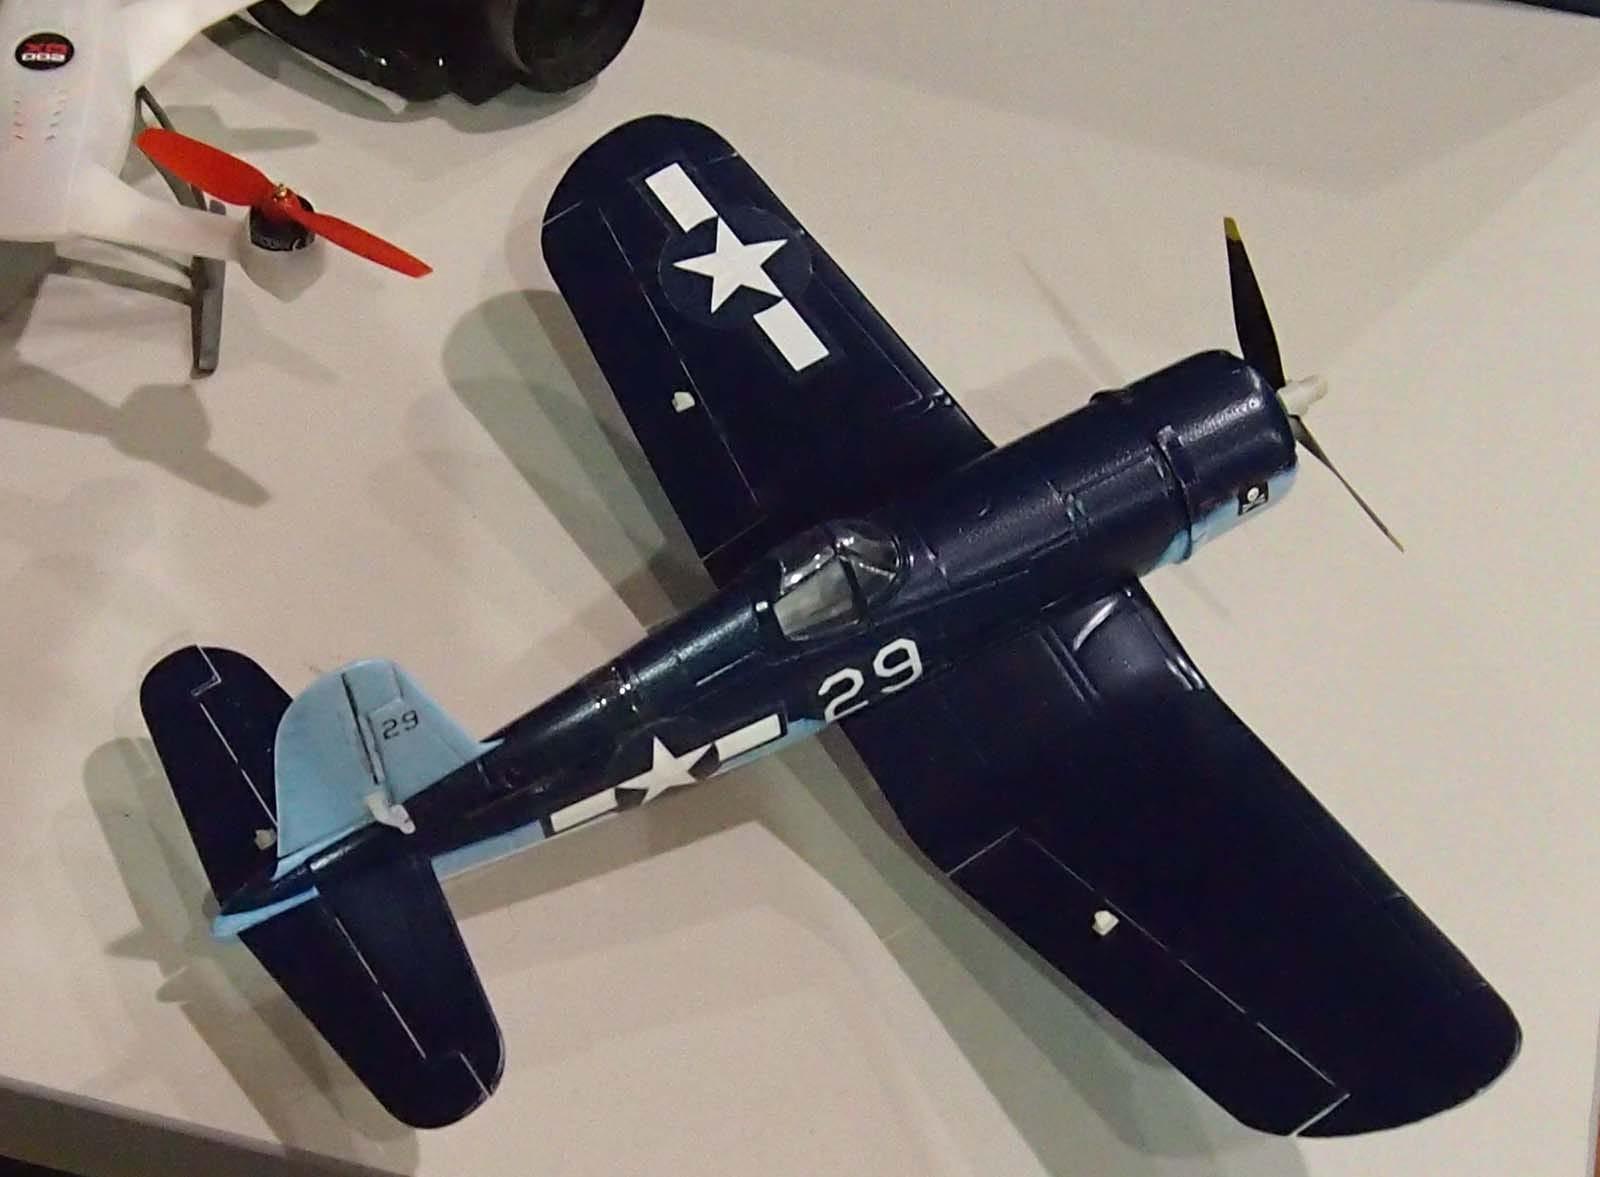 Corsair RC Plane